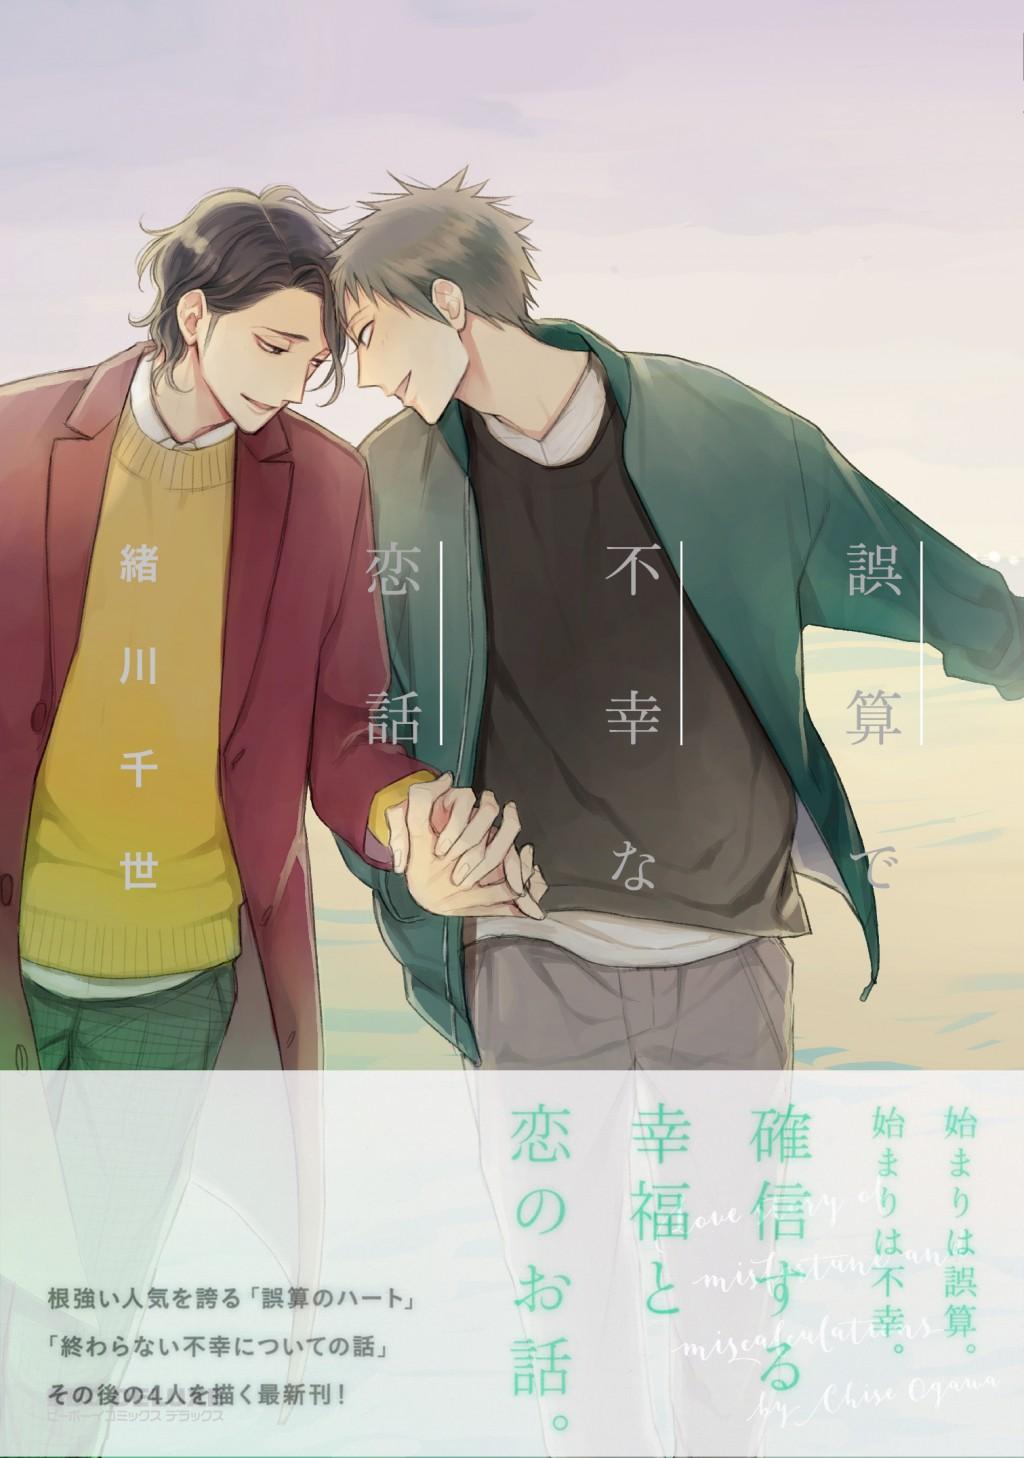 緒川千世先生大人気「誤算シリーズ」第3作目:「誤算で不幸な恋話」清竹×烏童(兄) 烏童(弟)×三城